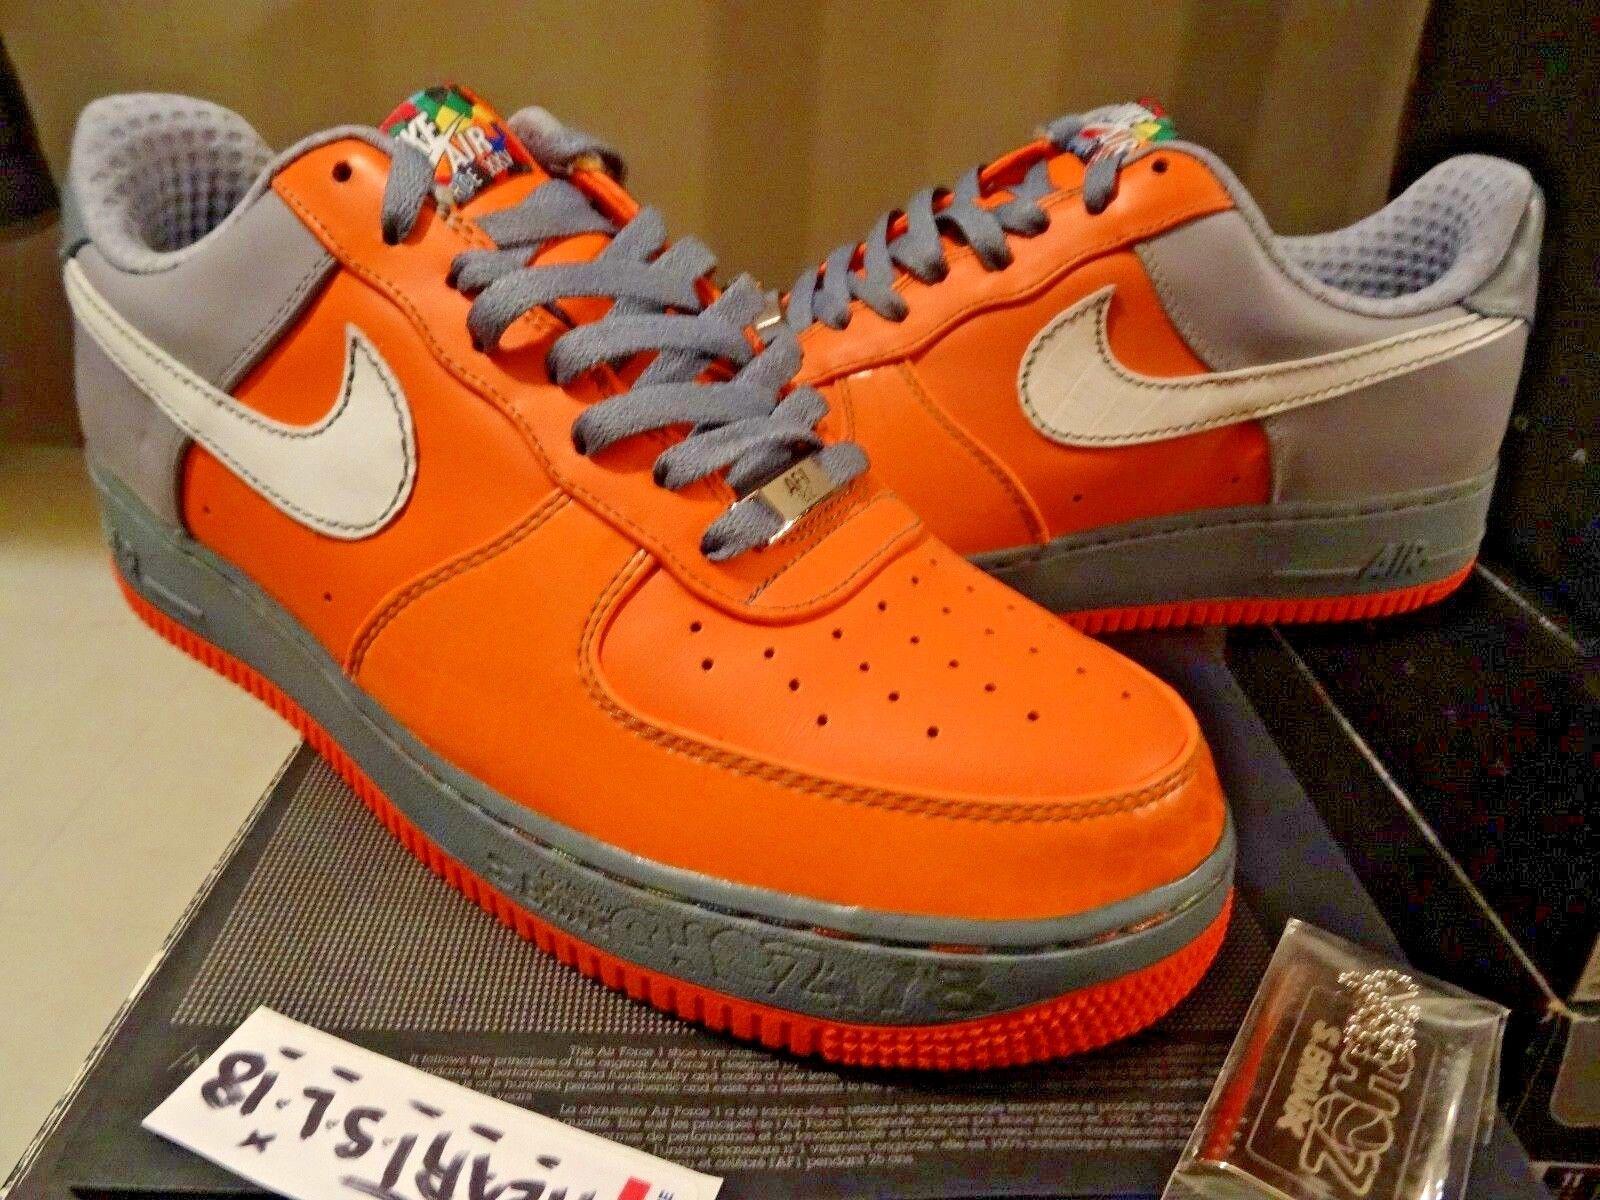 NEW Nike Air Force One '07 Premium  Choz  South Bronx NYC  315180-811 SZ 11 DUNK